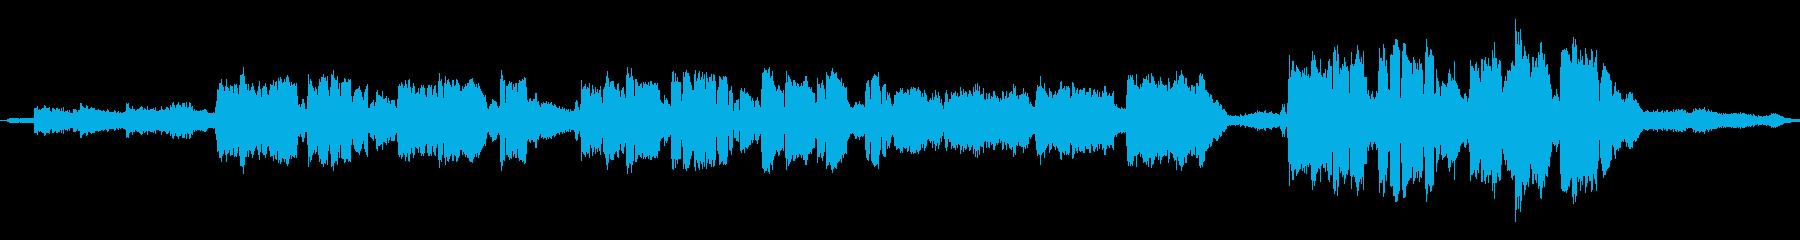 Lighthouse Melodiesの再生済みの波形